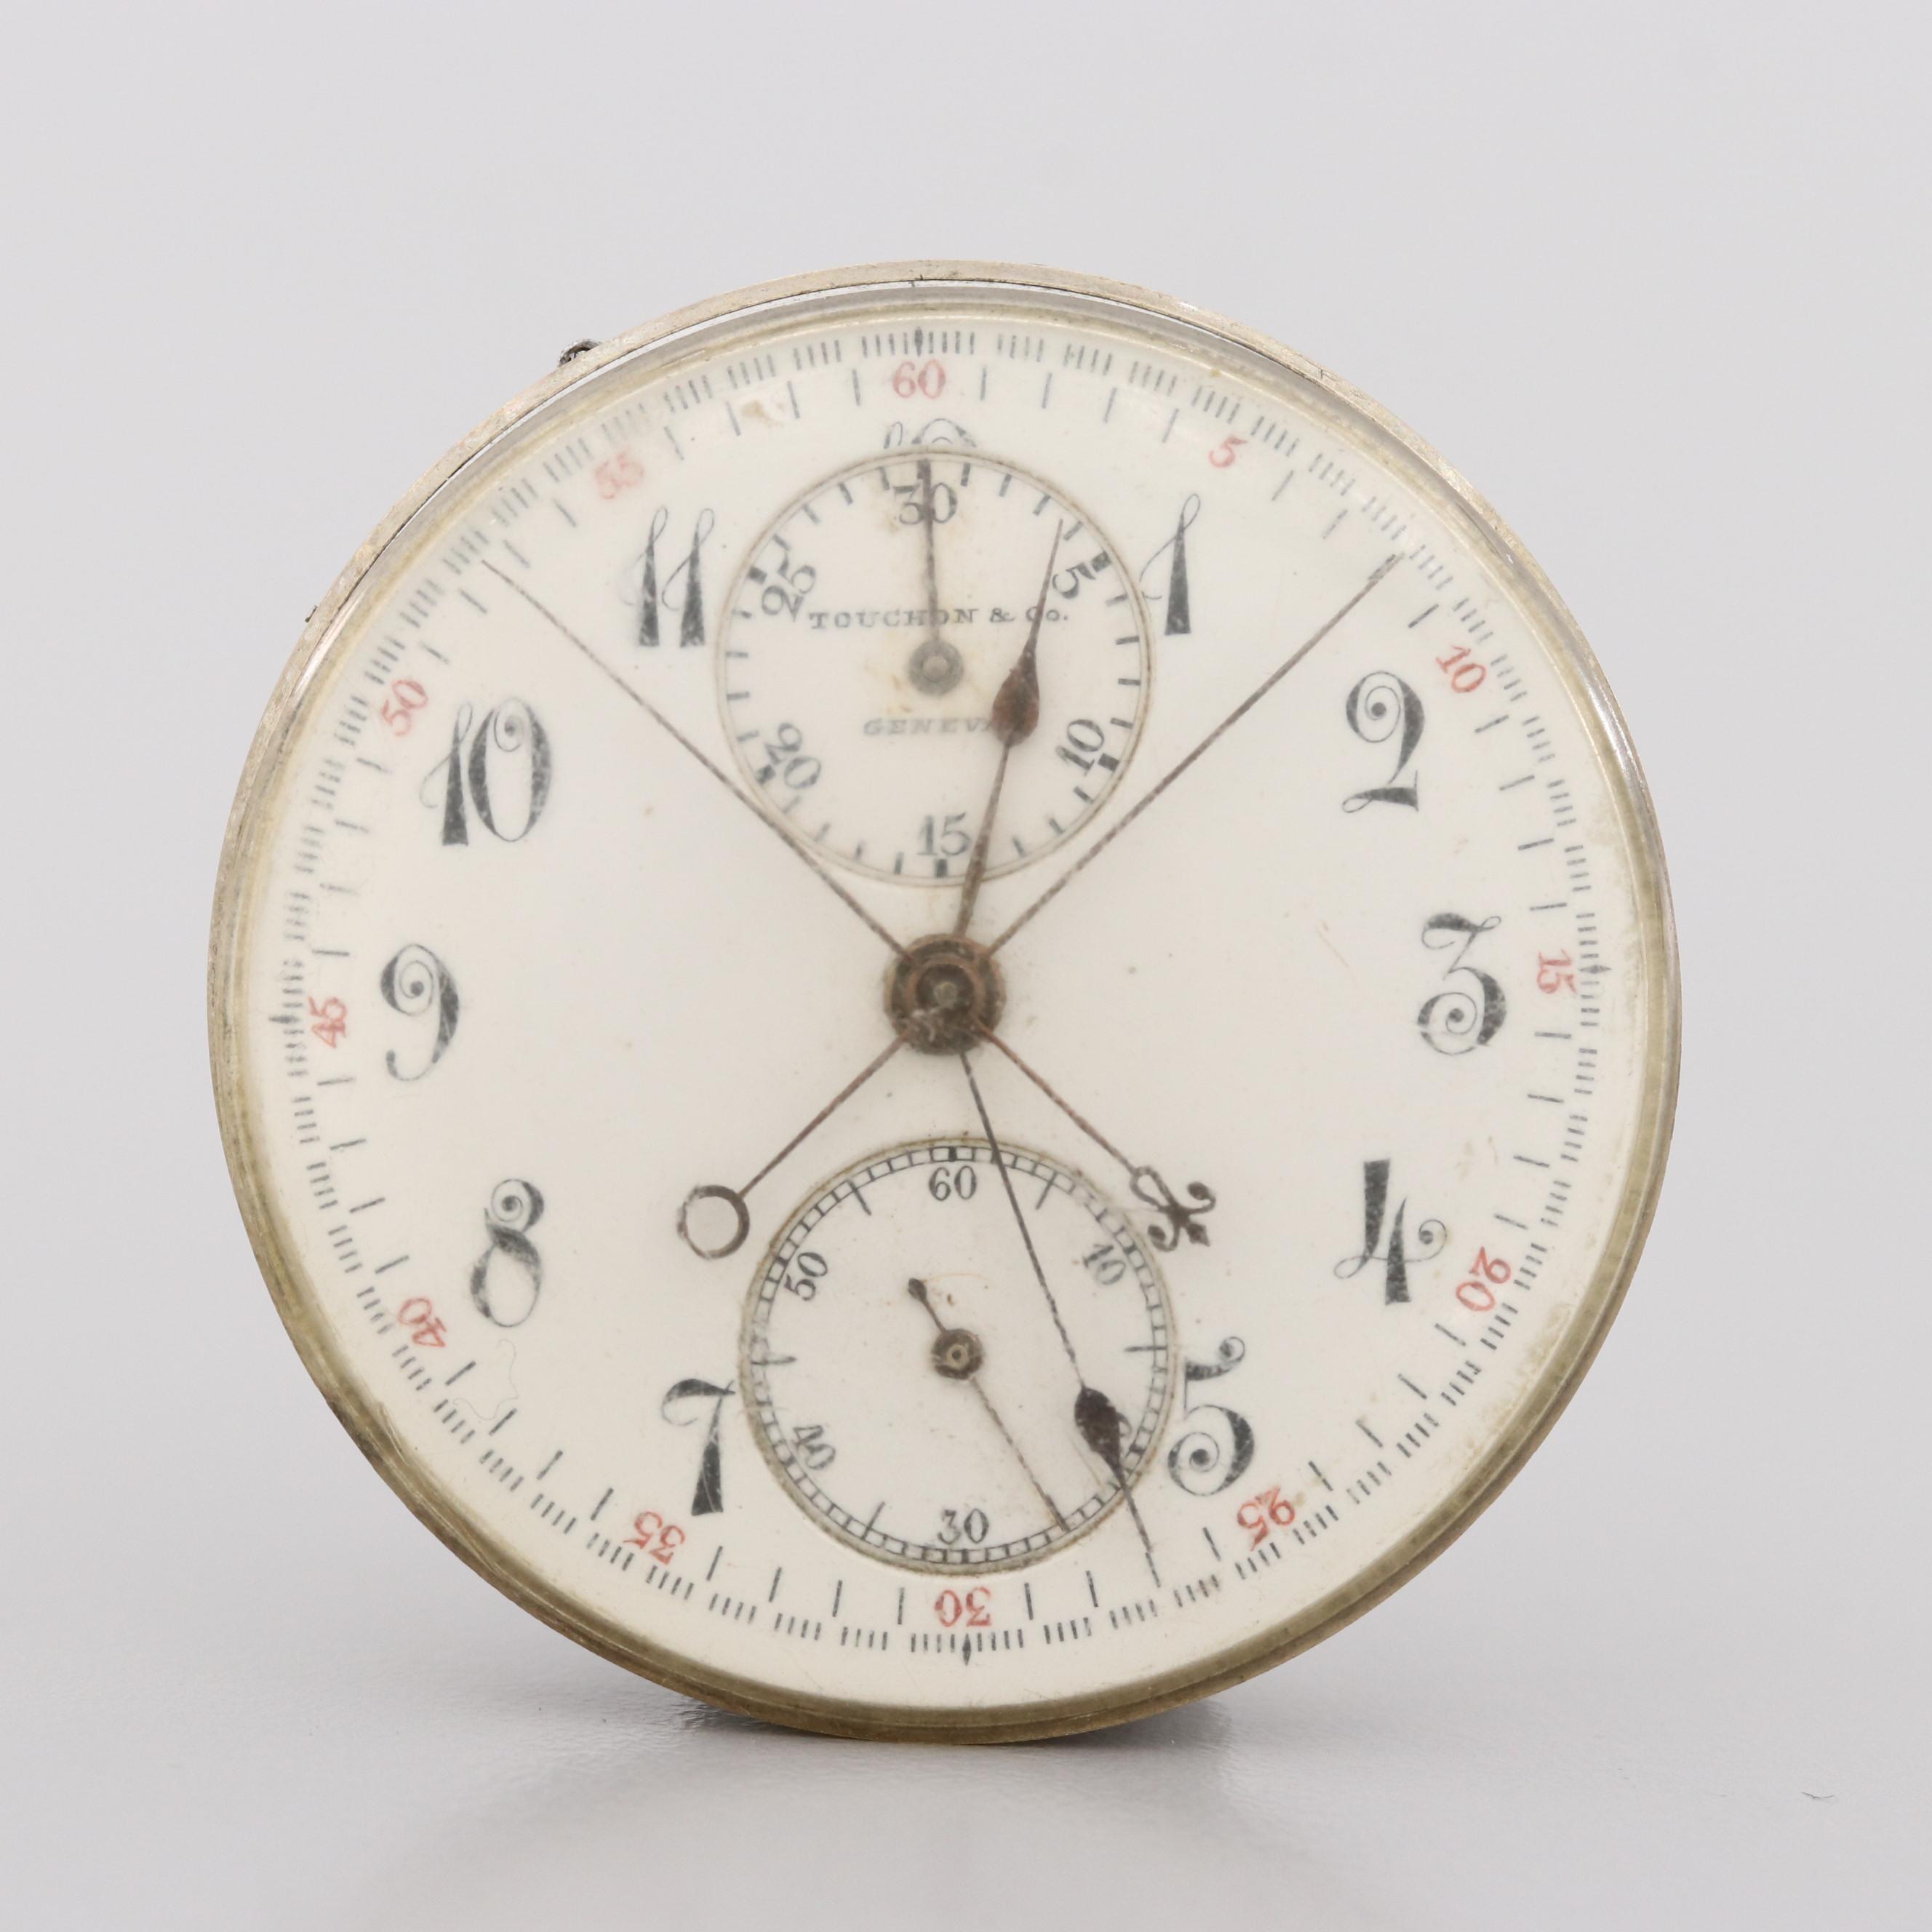 Antique Touchon & Co. Split Second Chronograph Movement and Dial